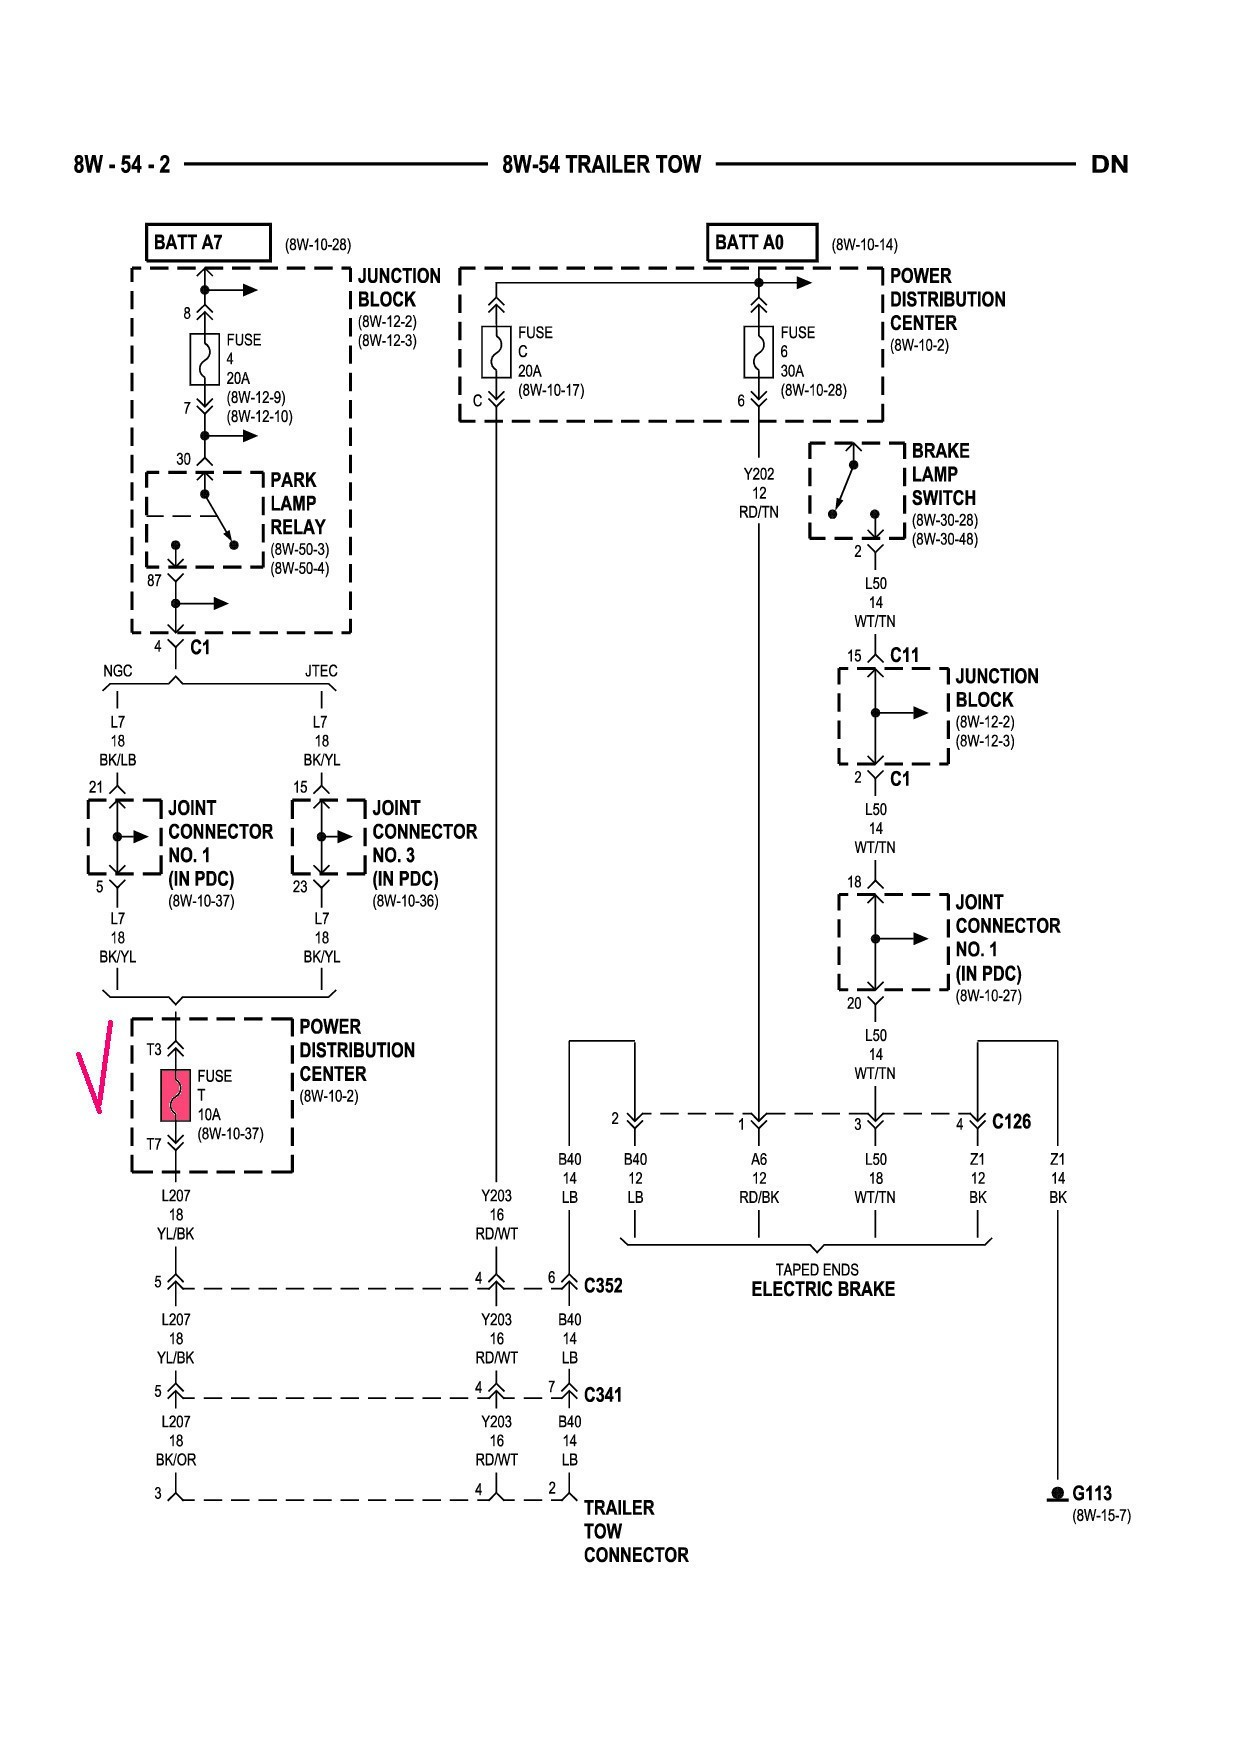 2004 dodge dakota trailer wiring diagram deconstructmyhouse org rh  deconstructmyhouse org